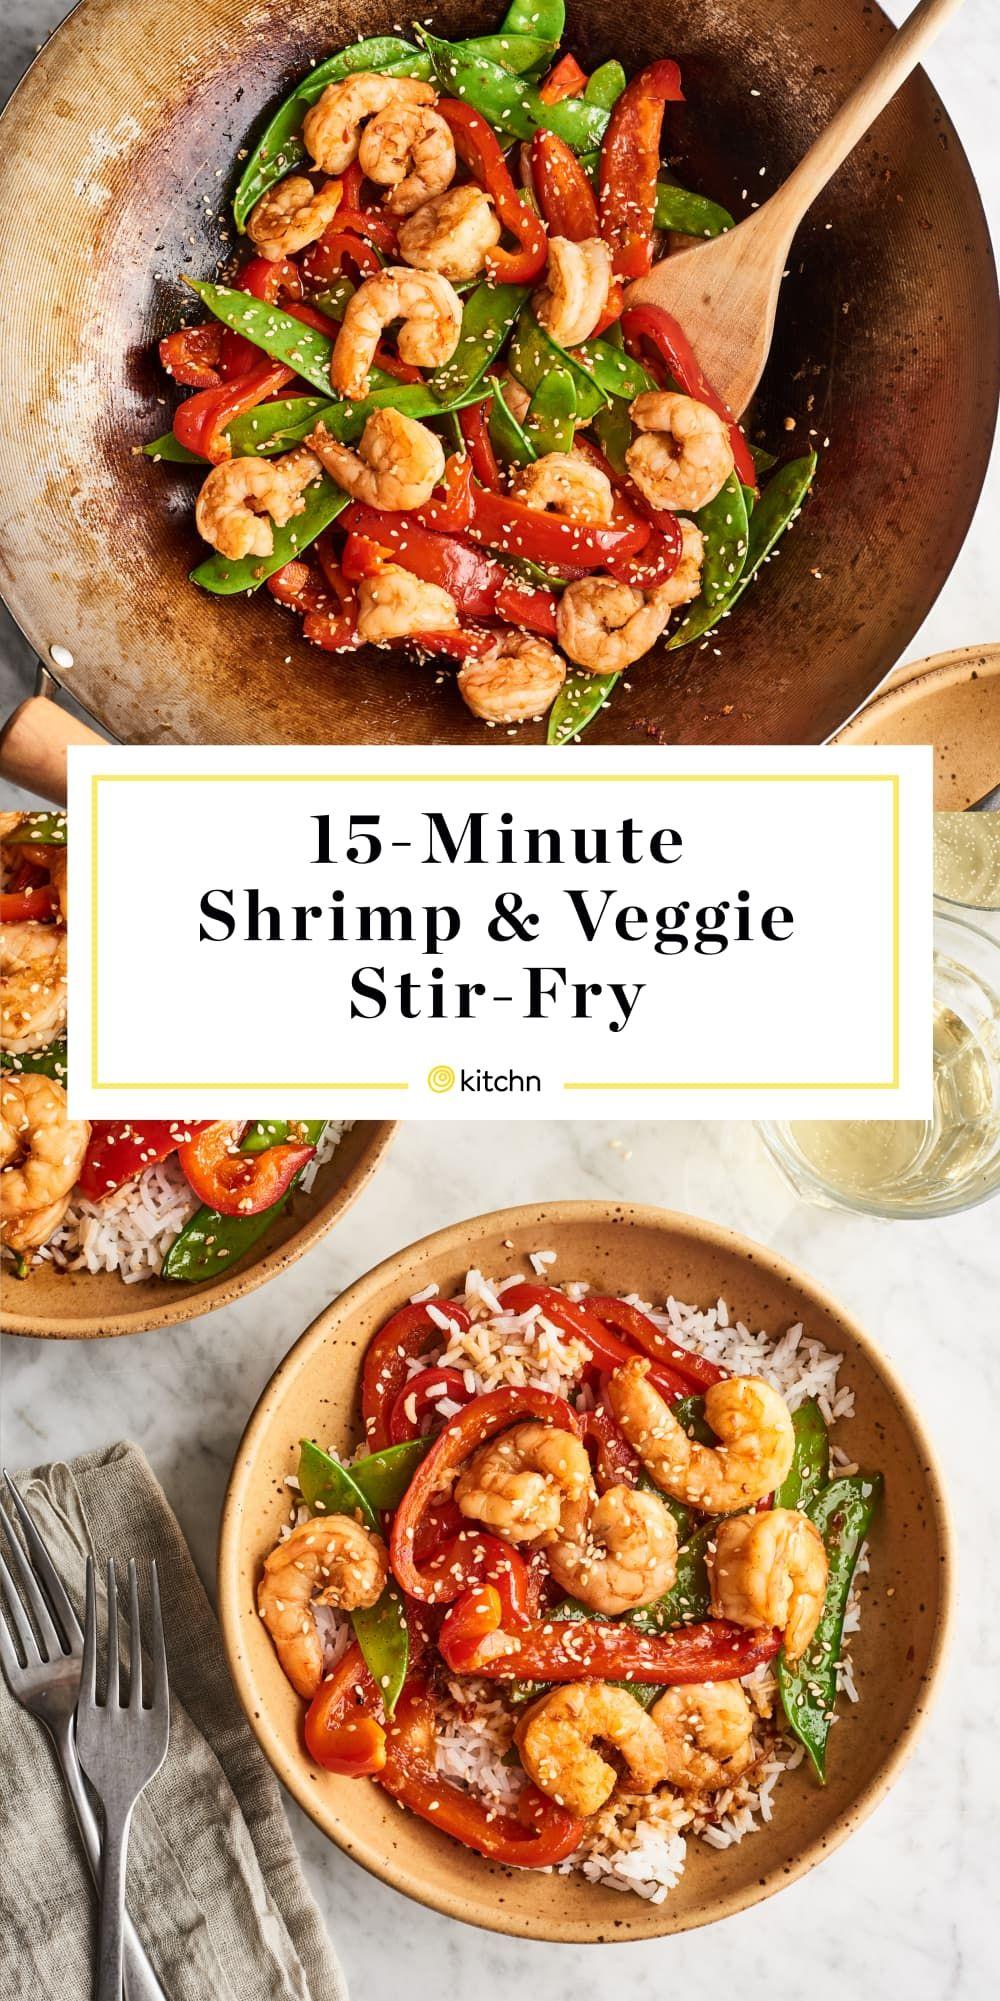 15-Minute Shrimp & Veggie Stir-Fry